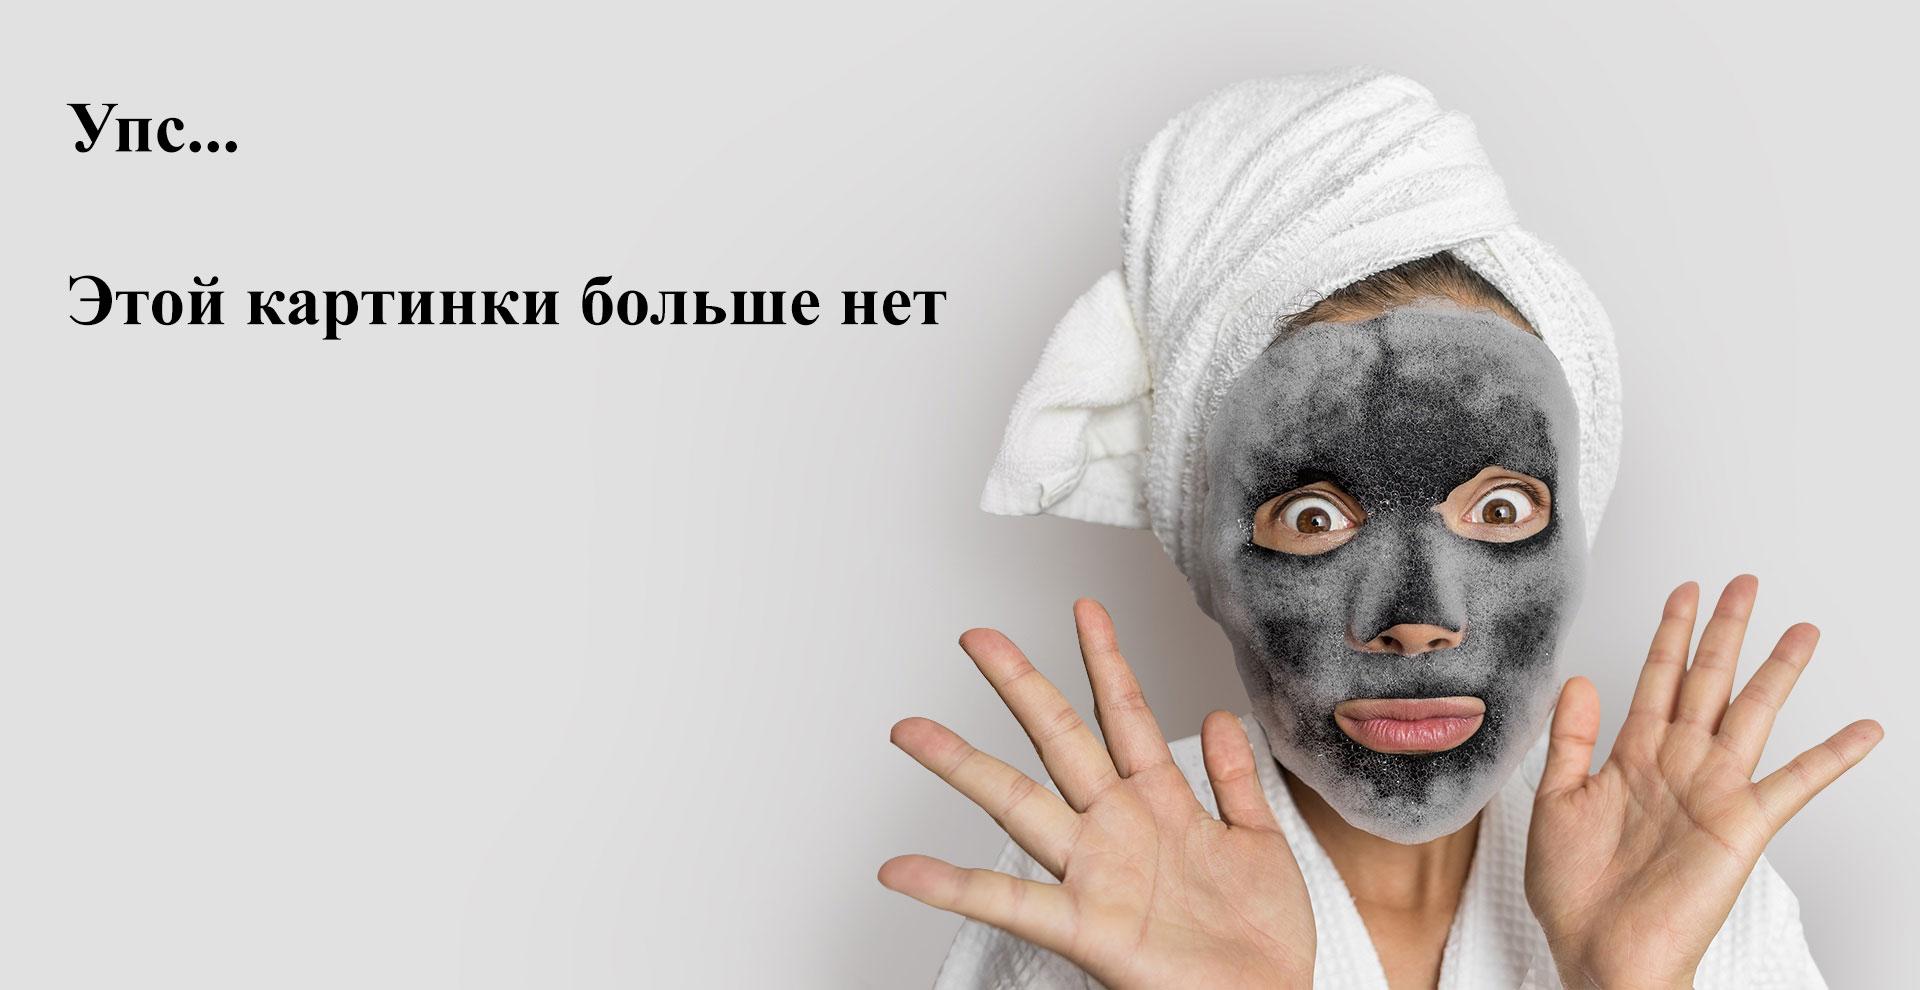 Shary, Тканевая маска для лица Blue Clay 3 в 1, 25 г